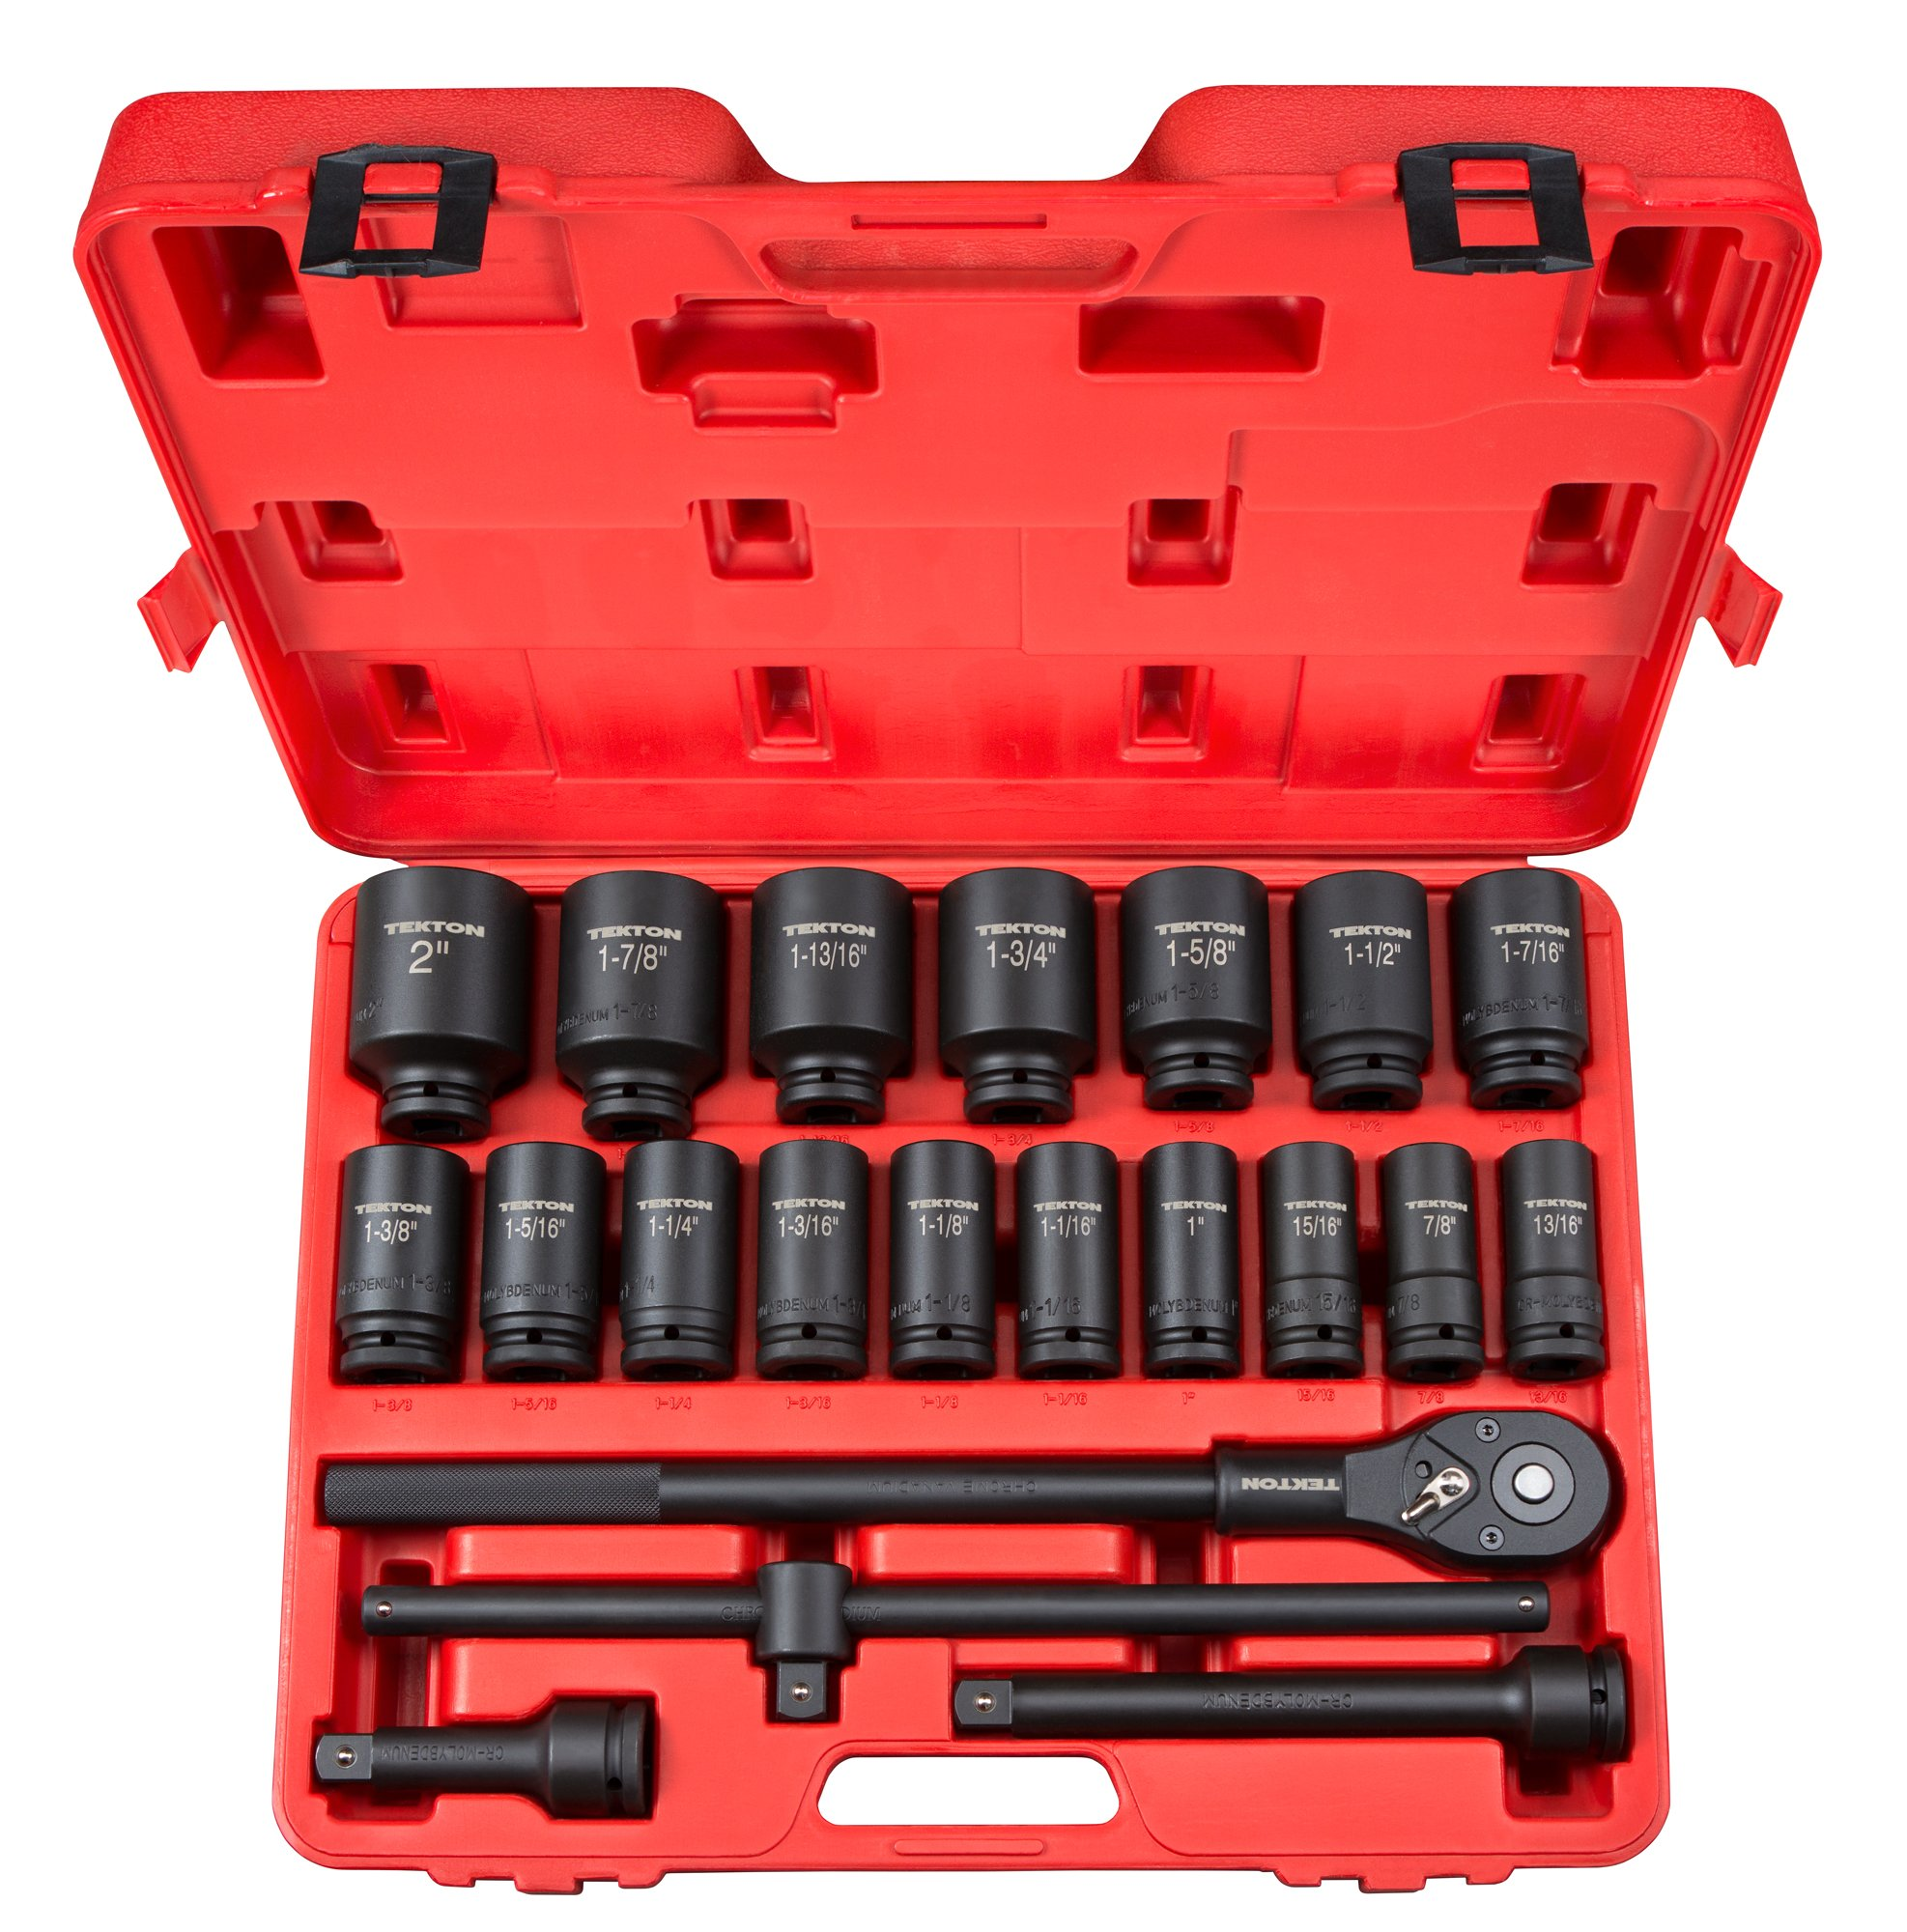 TEKTON 3/4-Inch Drive Deep Impact Socket Set, Inch, Cr-Mo, 7/8-Inch - 2-Inch, 22-Piece   48995